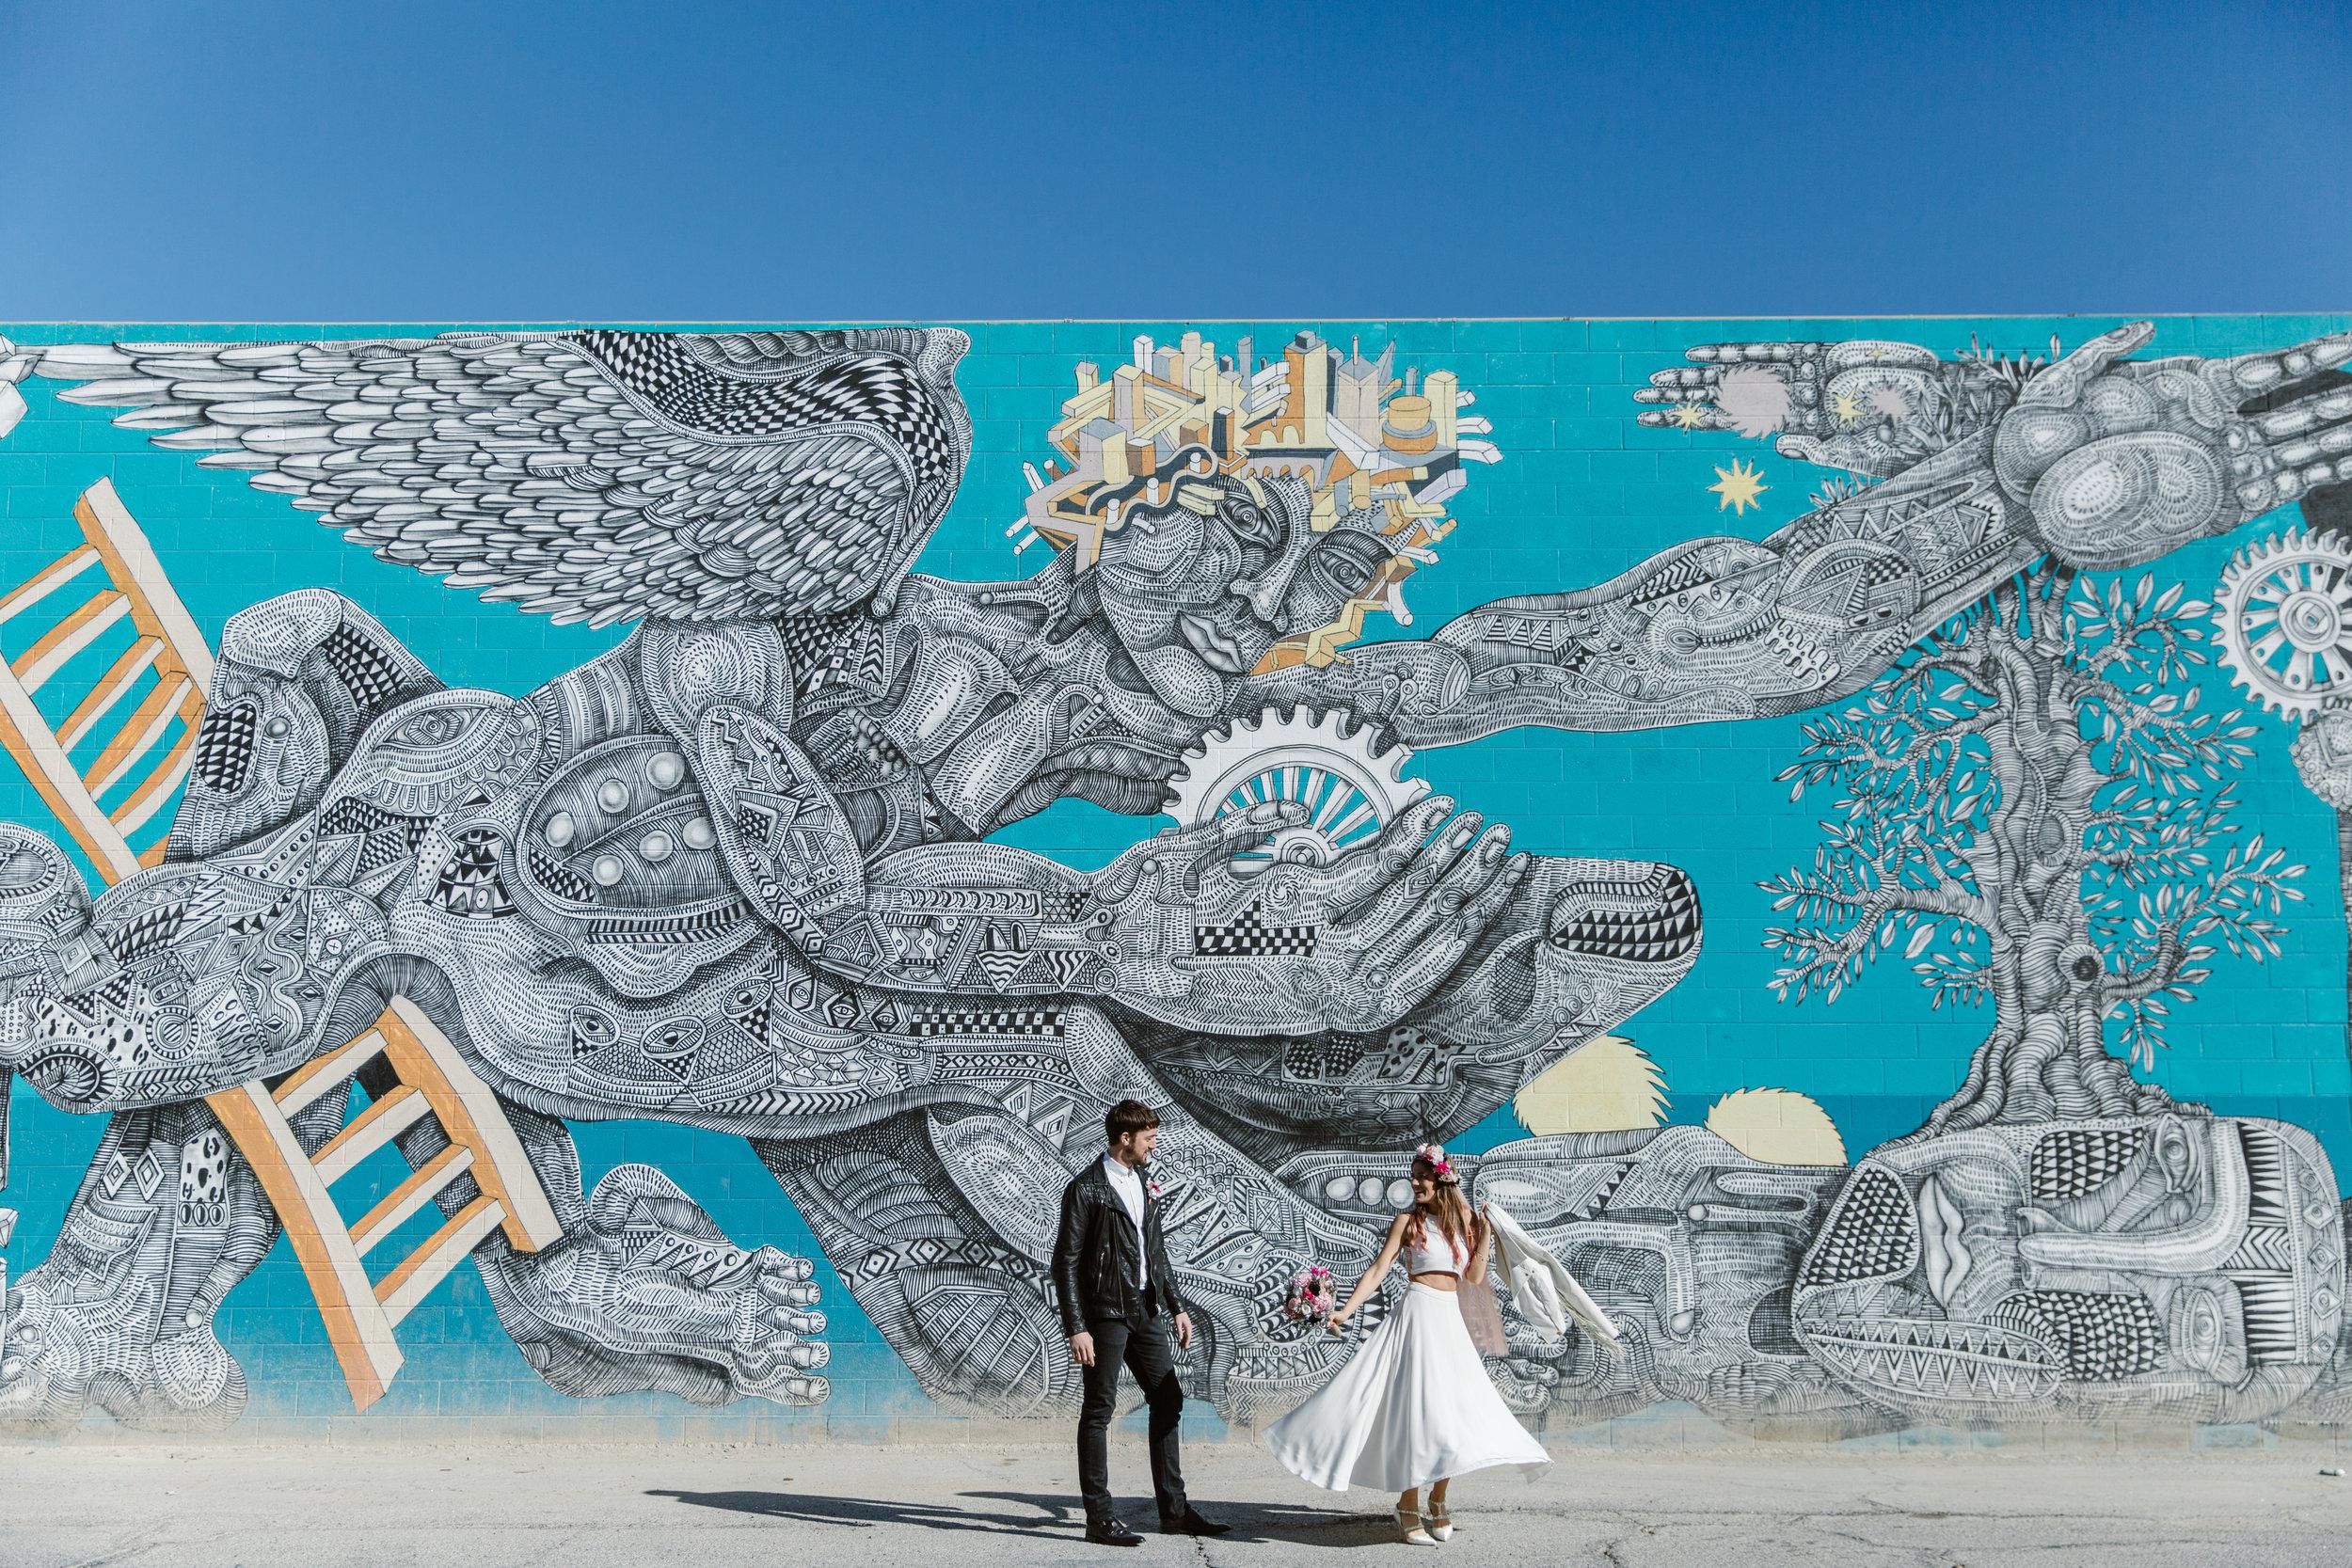 Graffiti_Mural_Natalie J Watts